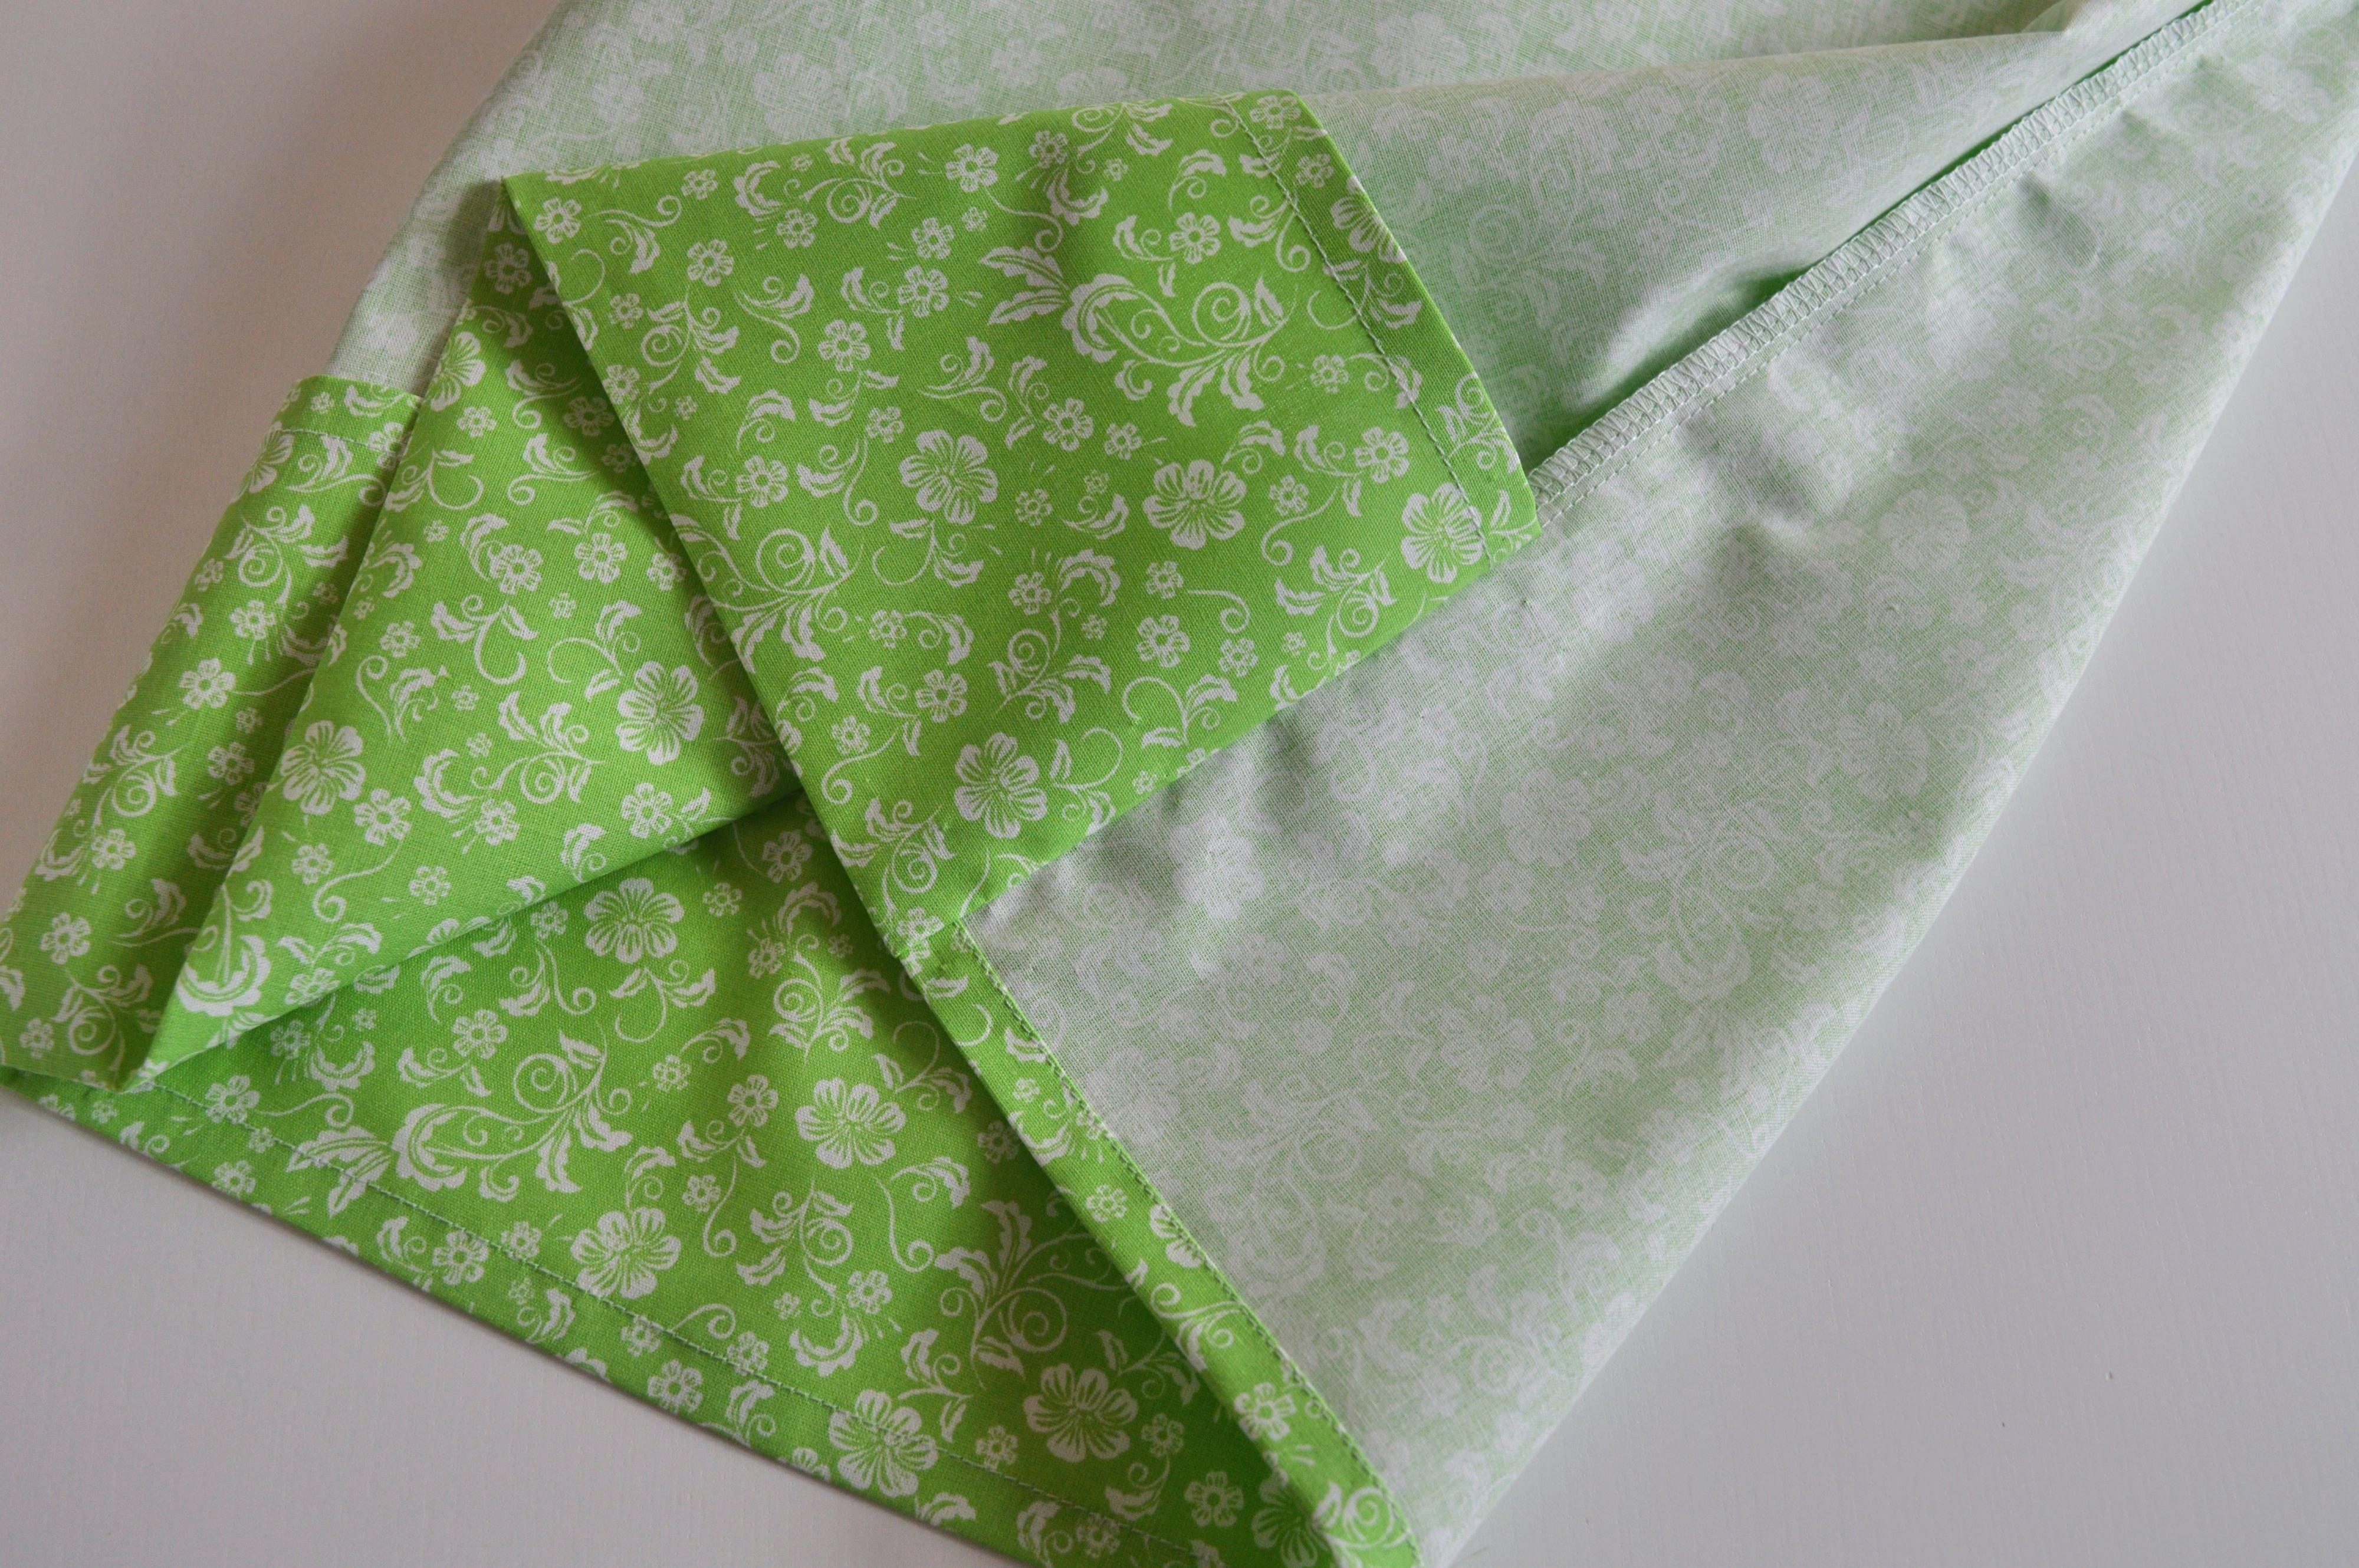 Sewing Pillowcase 3 Ways To Make Closure Beginner Sewing Tutorial